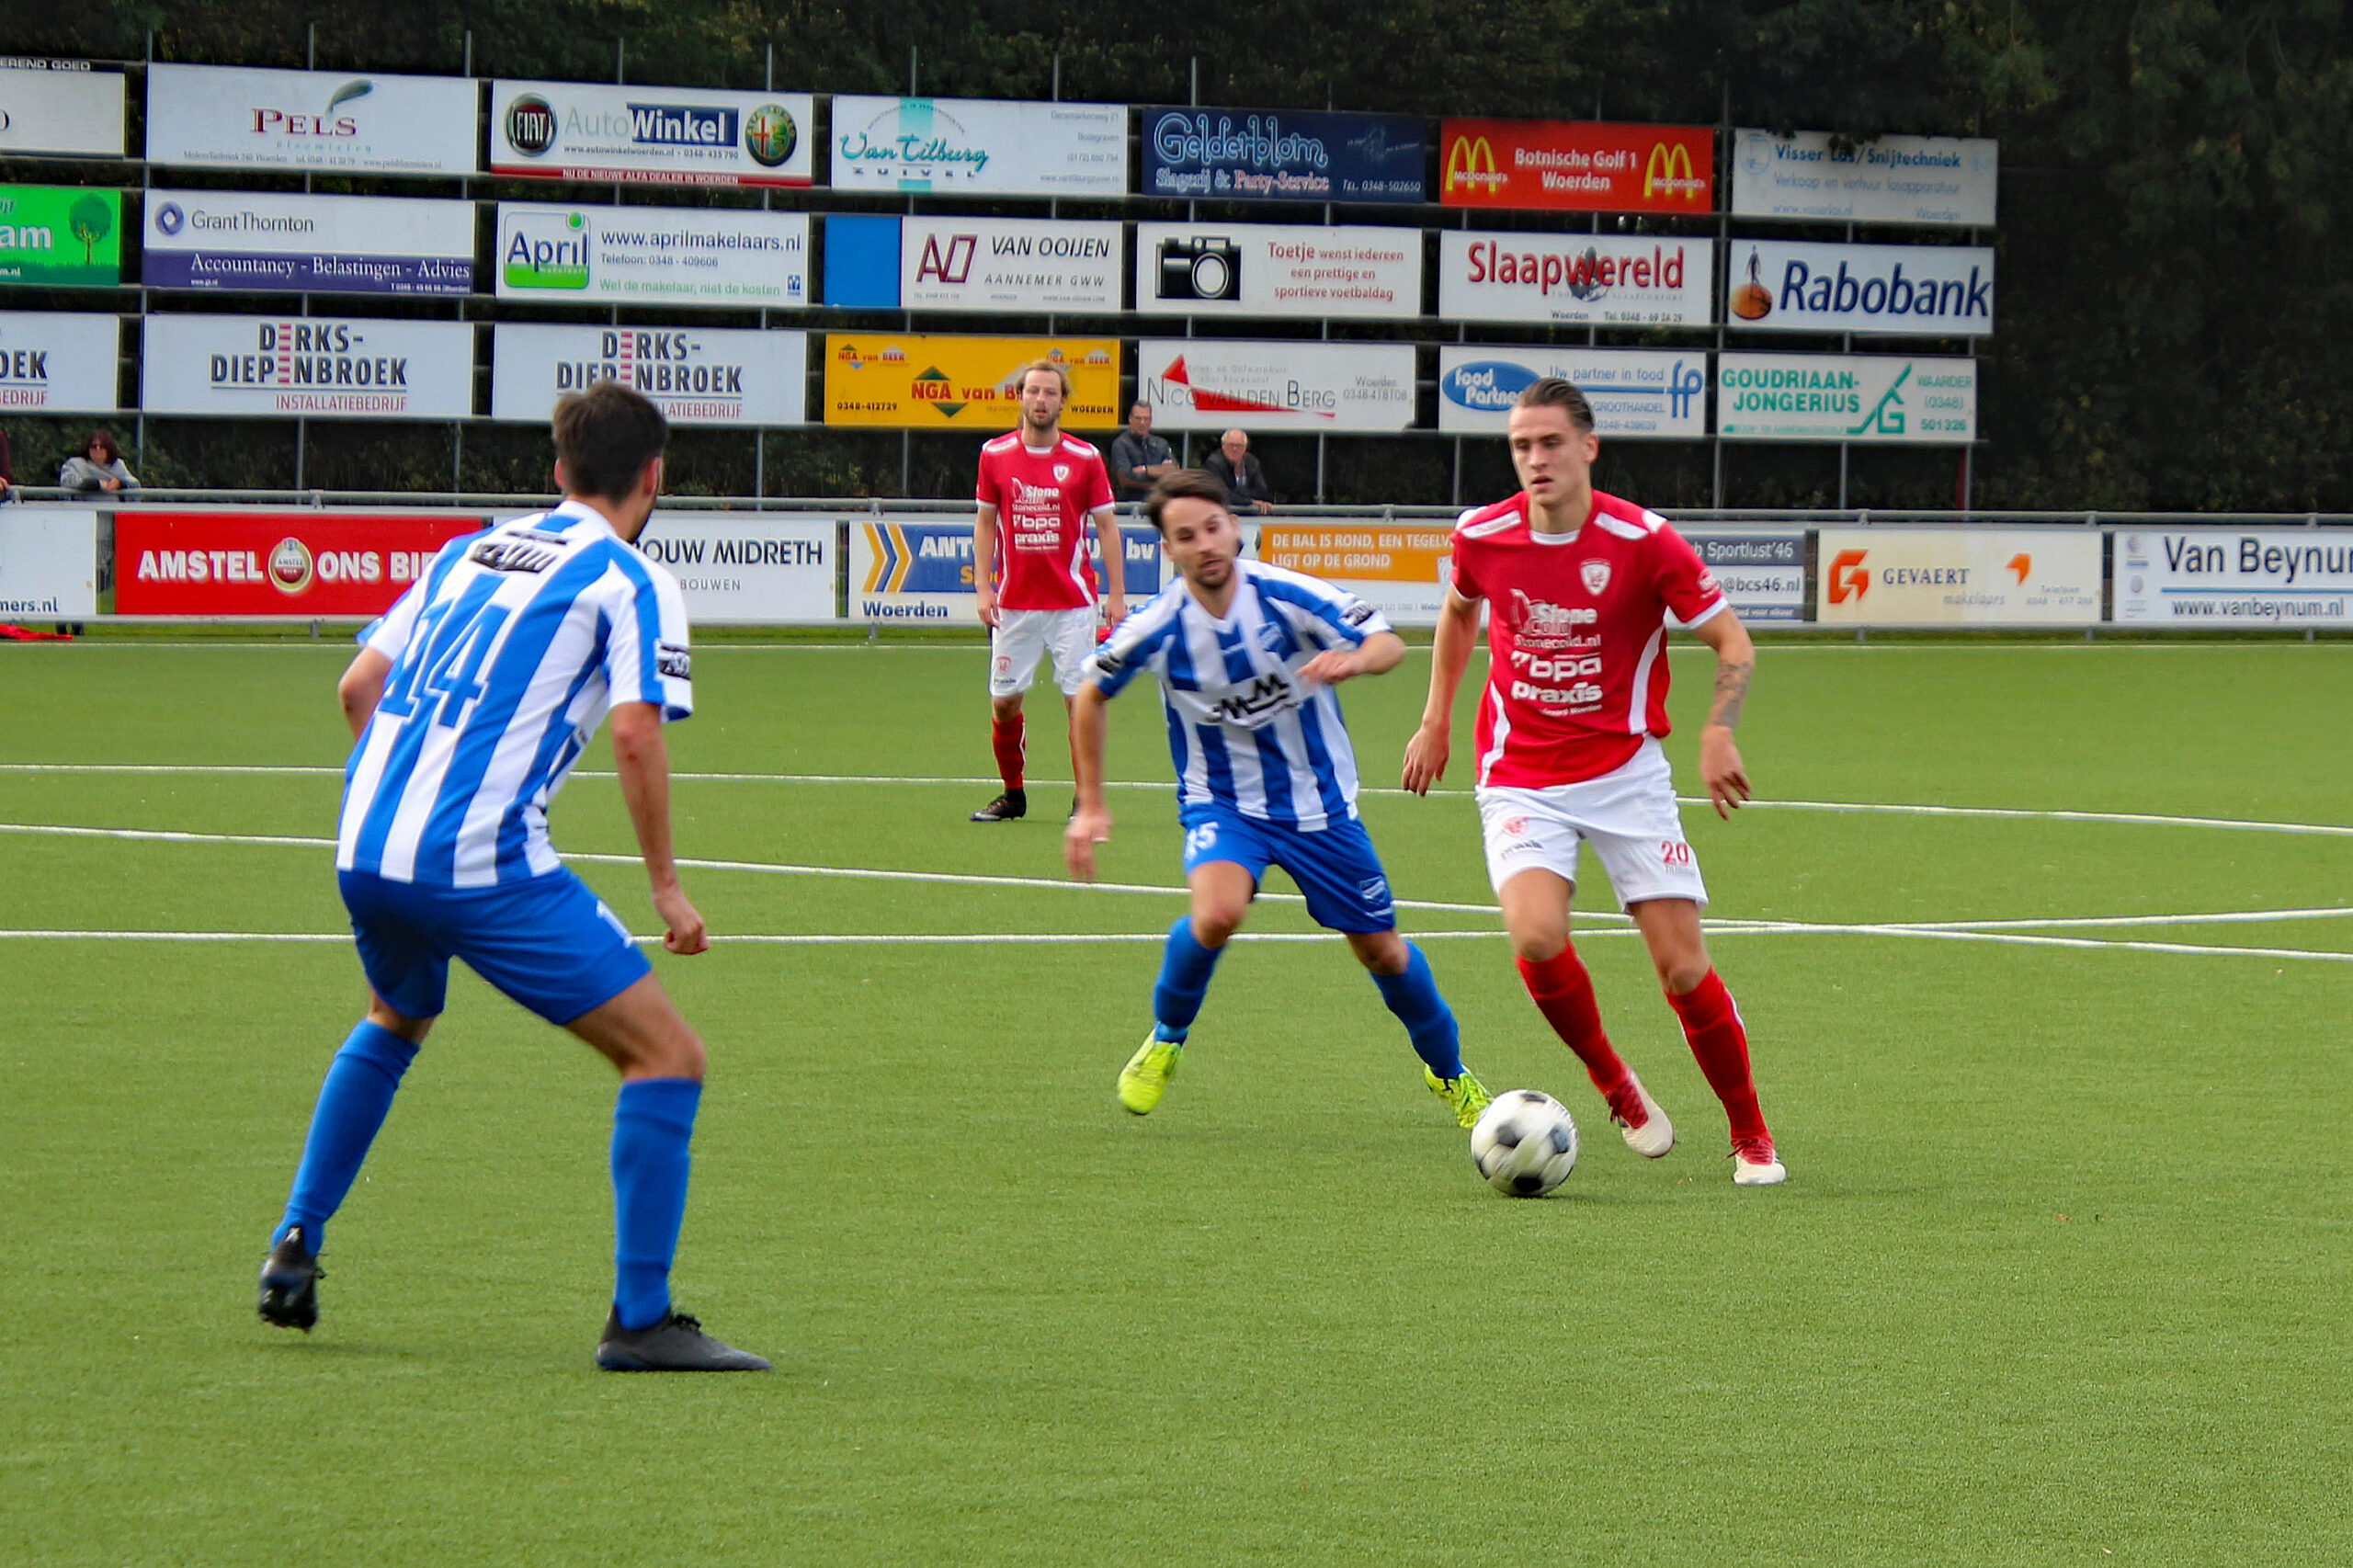 Thomas Heideman Sportlust - Almkerk Arie Verhagen